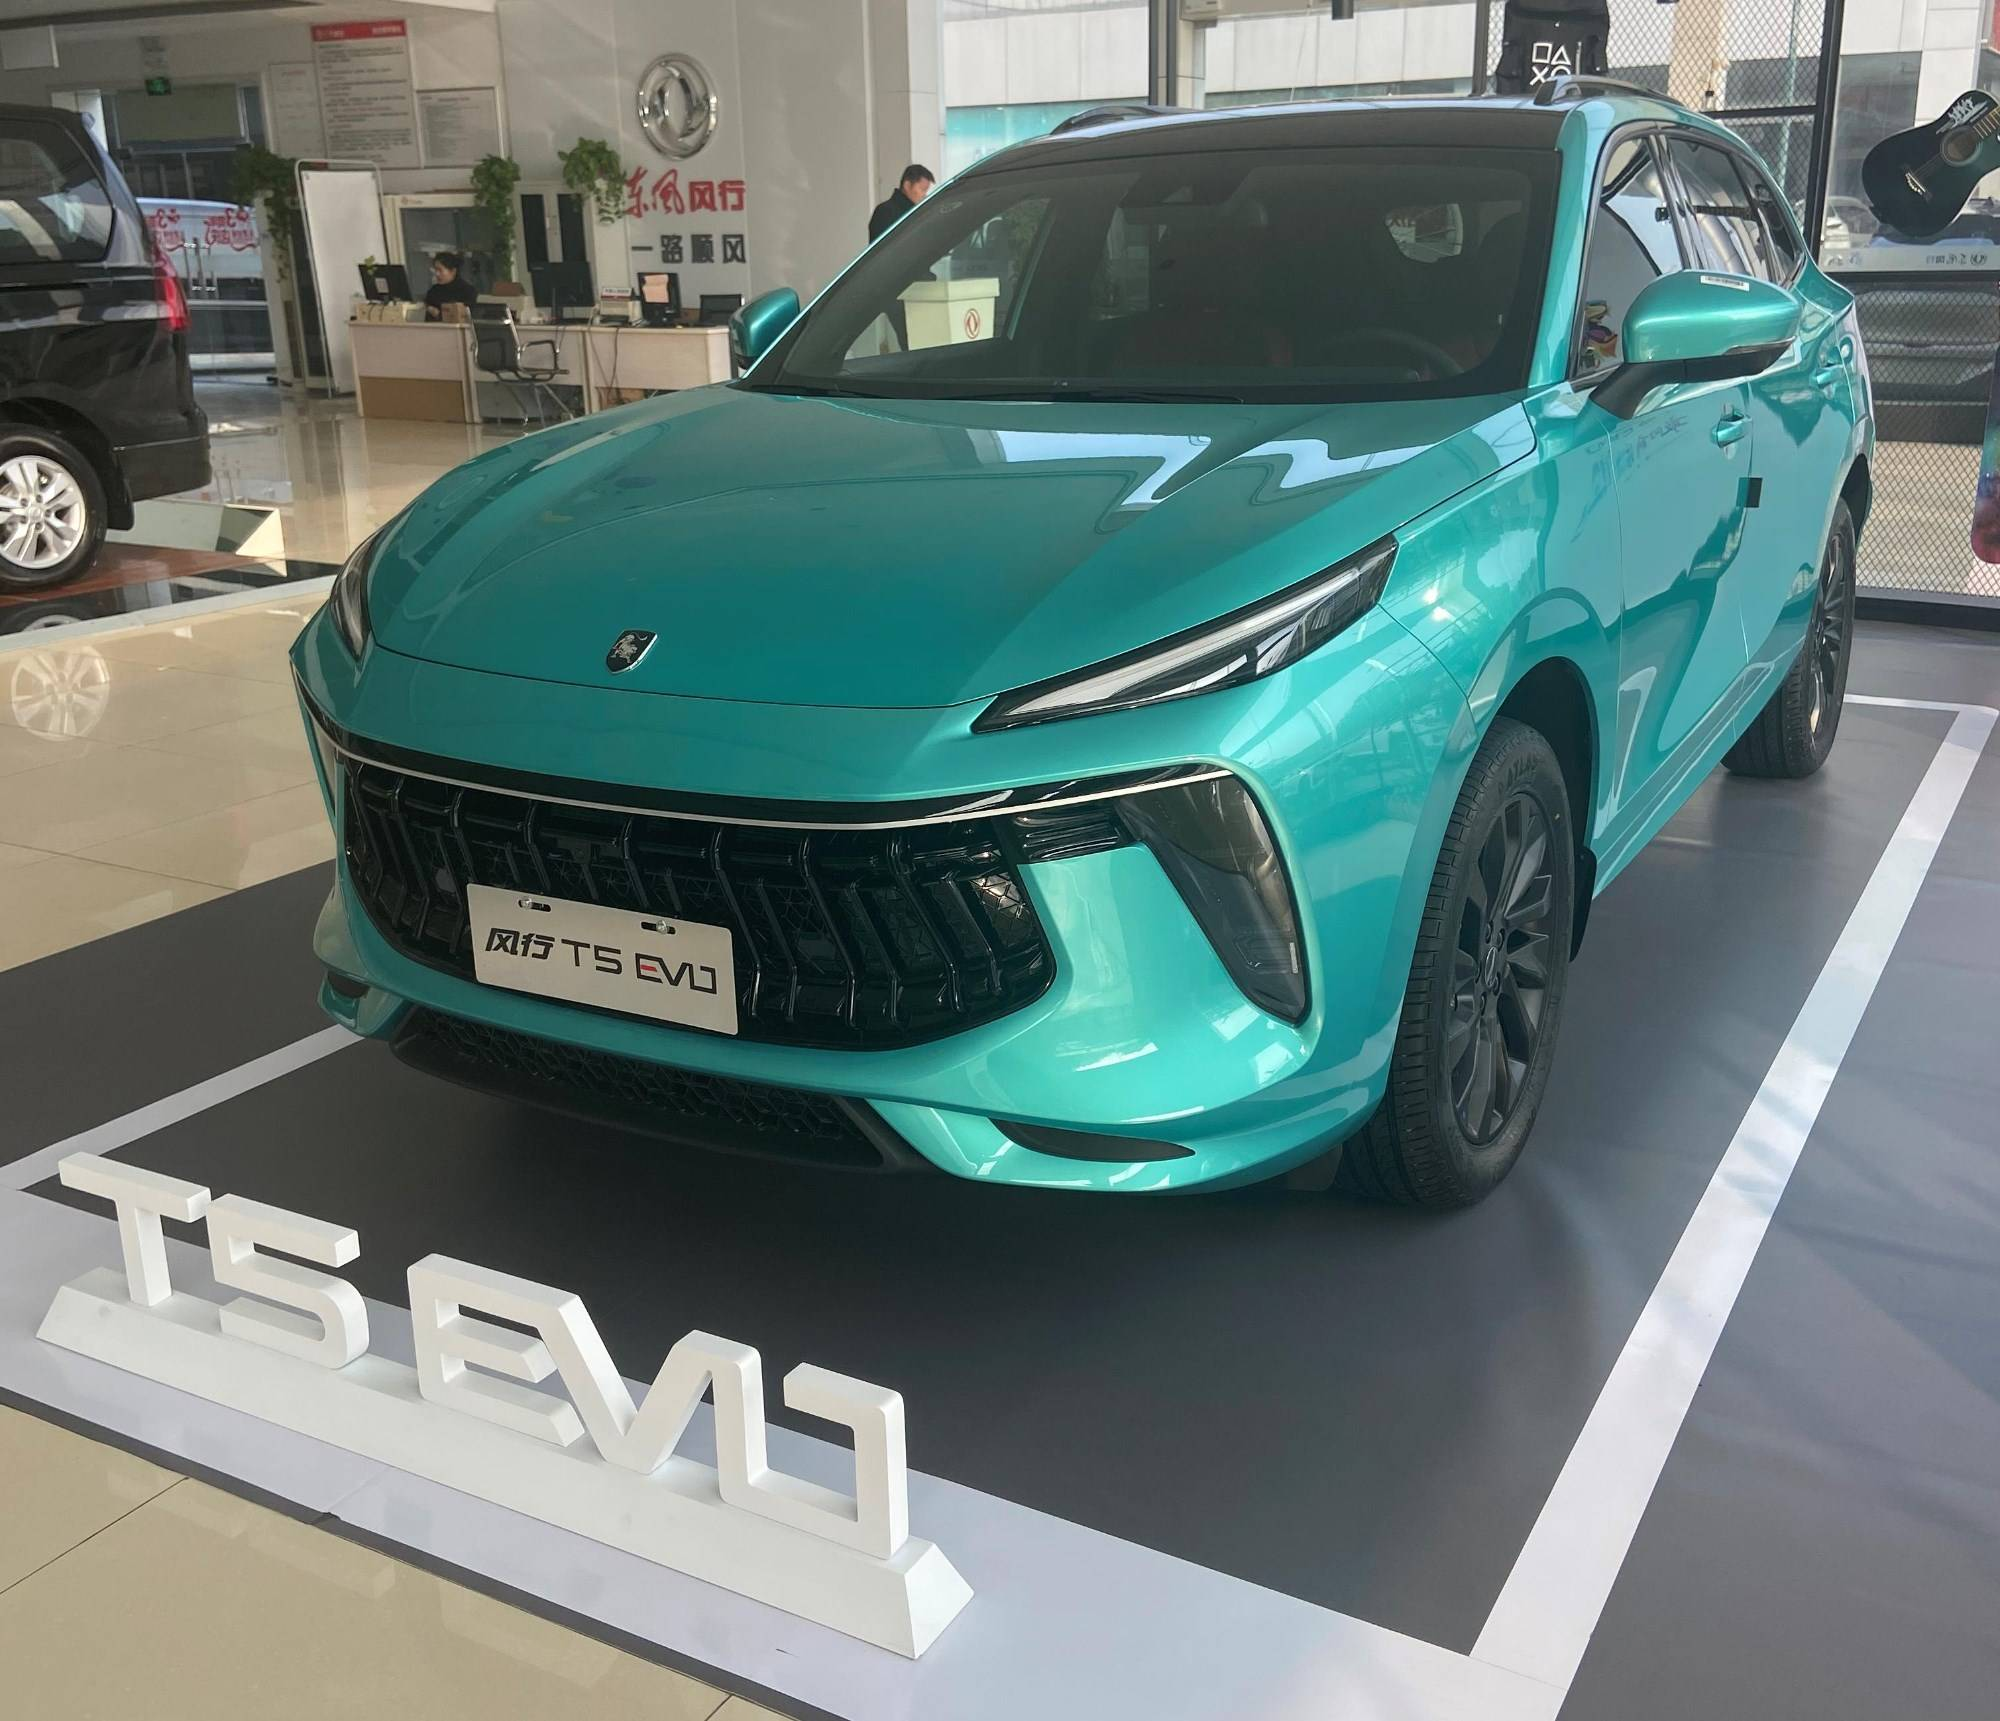 T5EVO不仅是质量堪比30万的第二好看的车